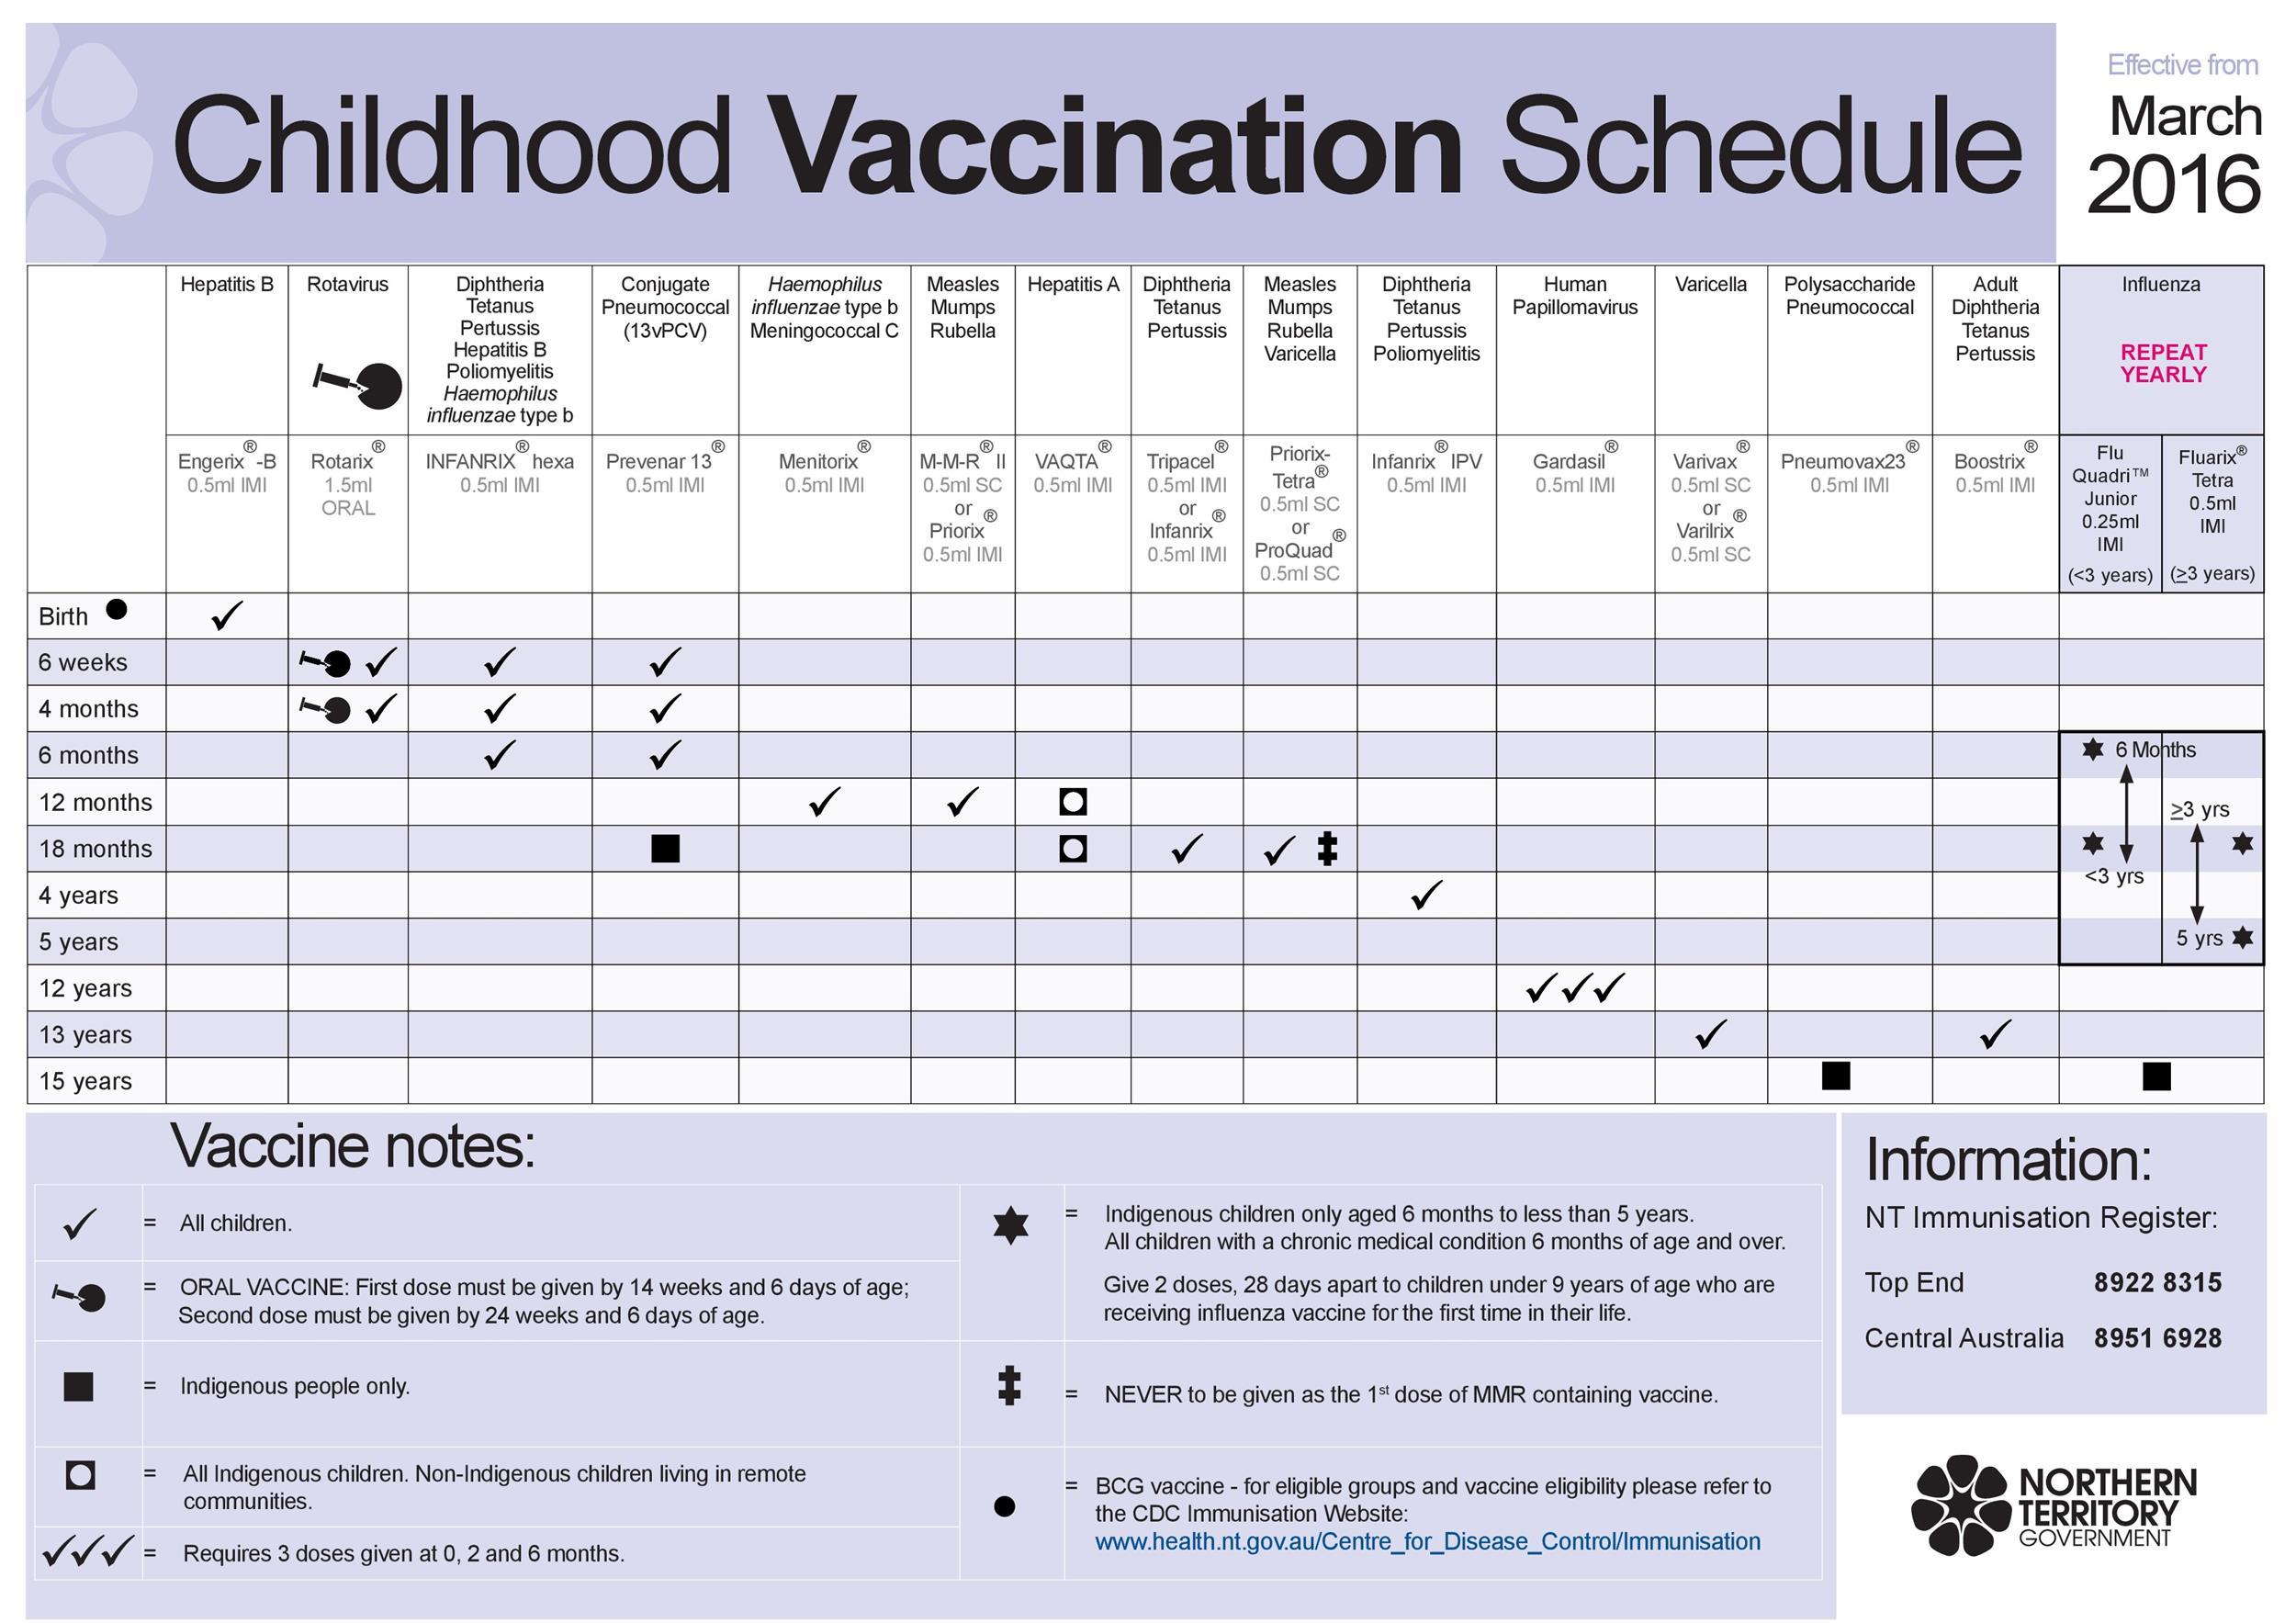 Immunization & Vaccination Schedule